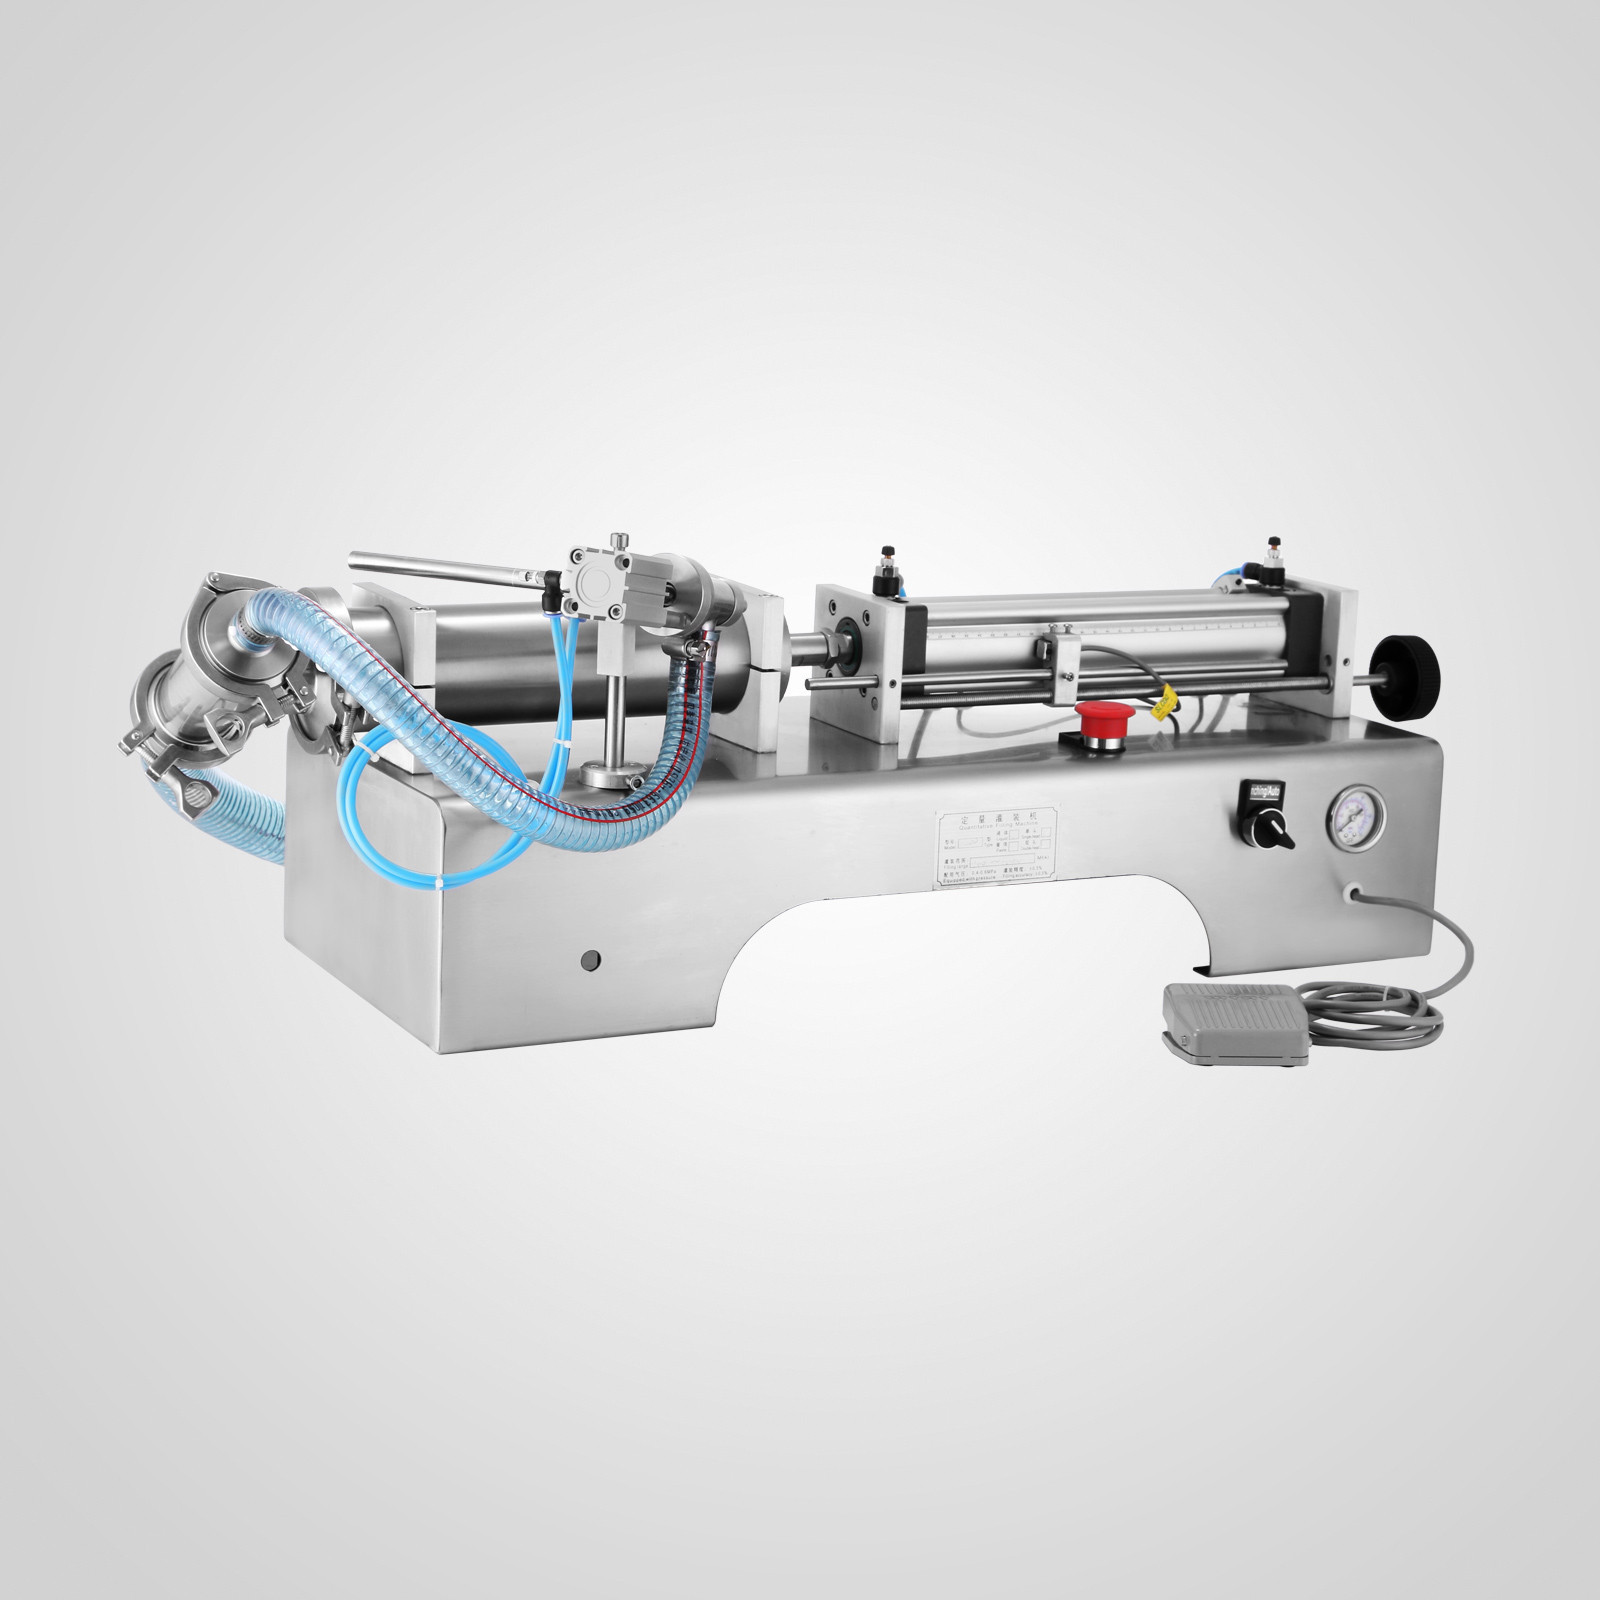 Liquid-Filling-Machine-Filler-Remplissage-2-3500ML-50-500ML-INDUSTRY-SUPPLY miniature 63